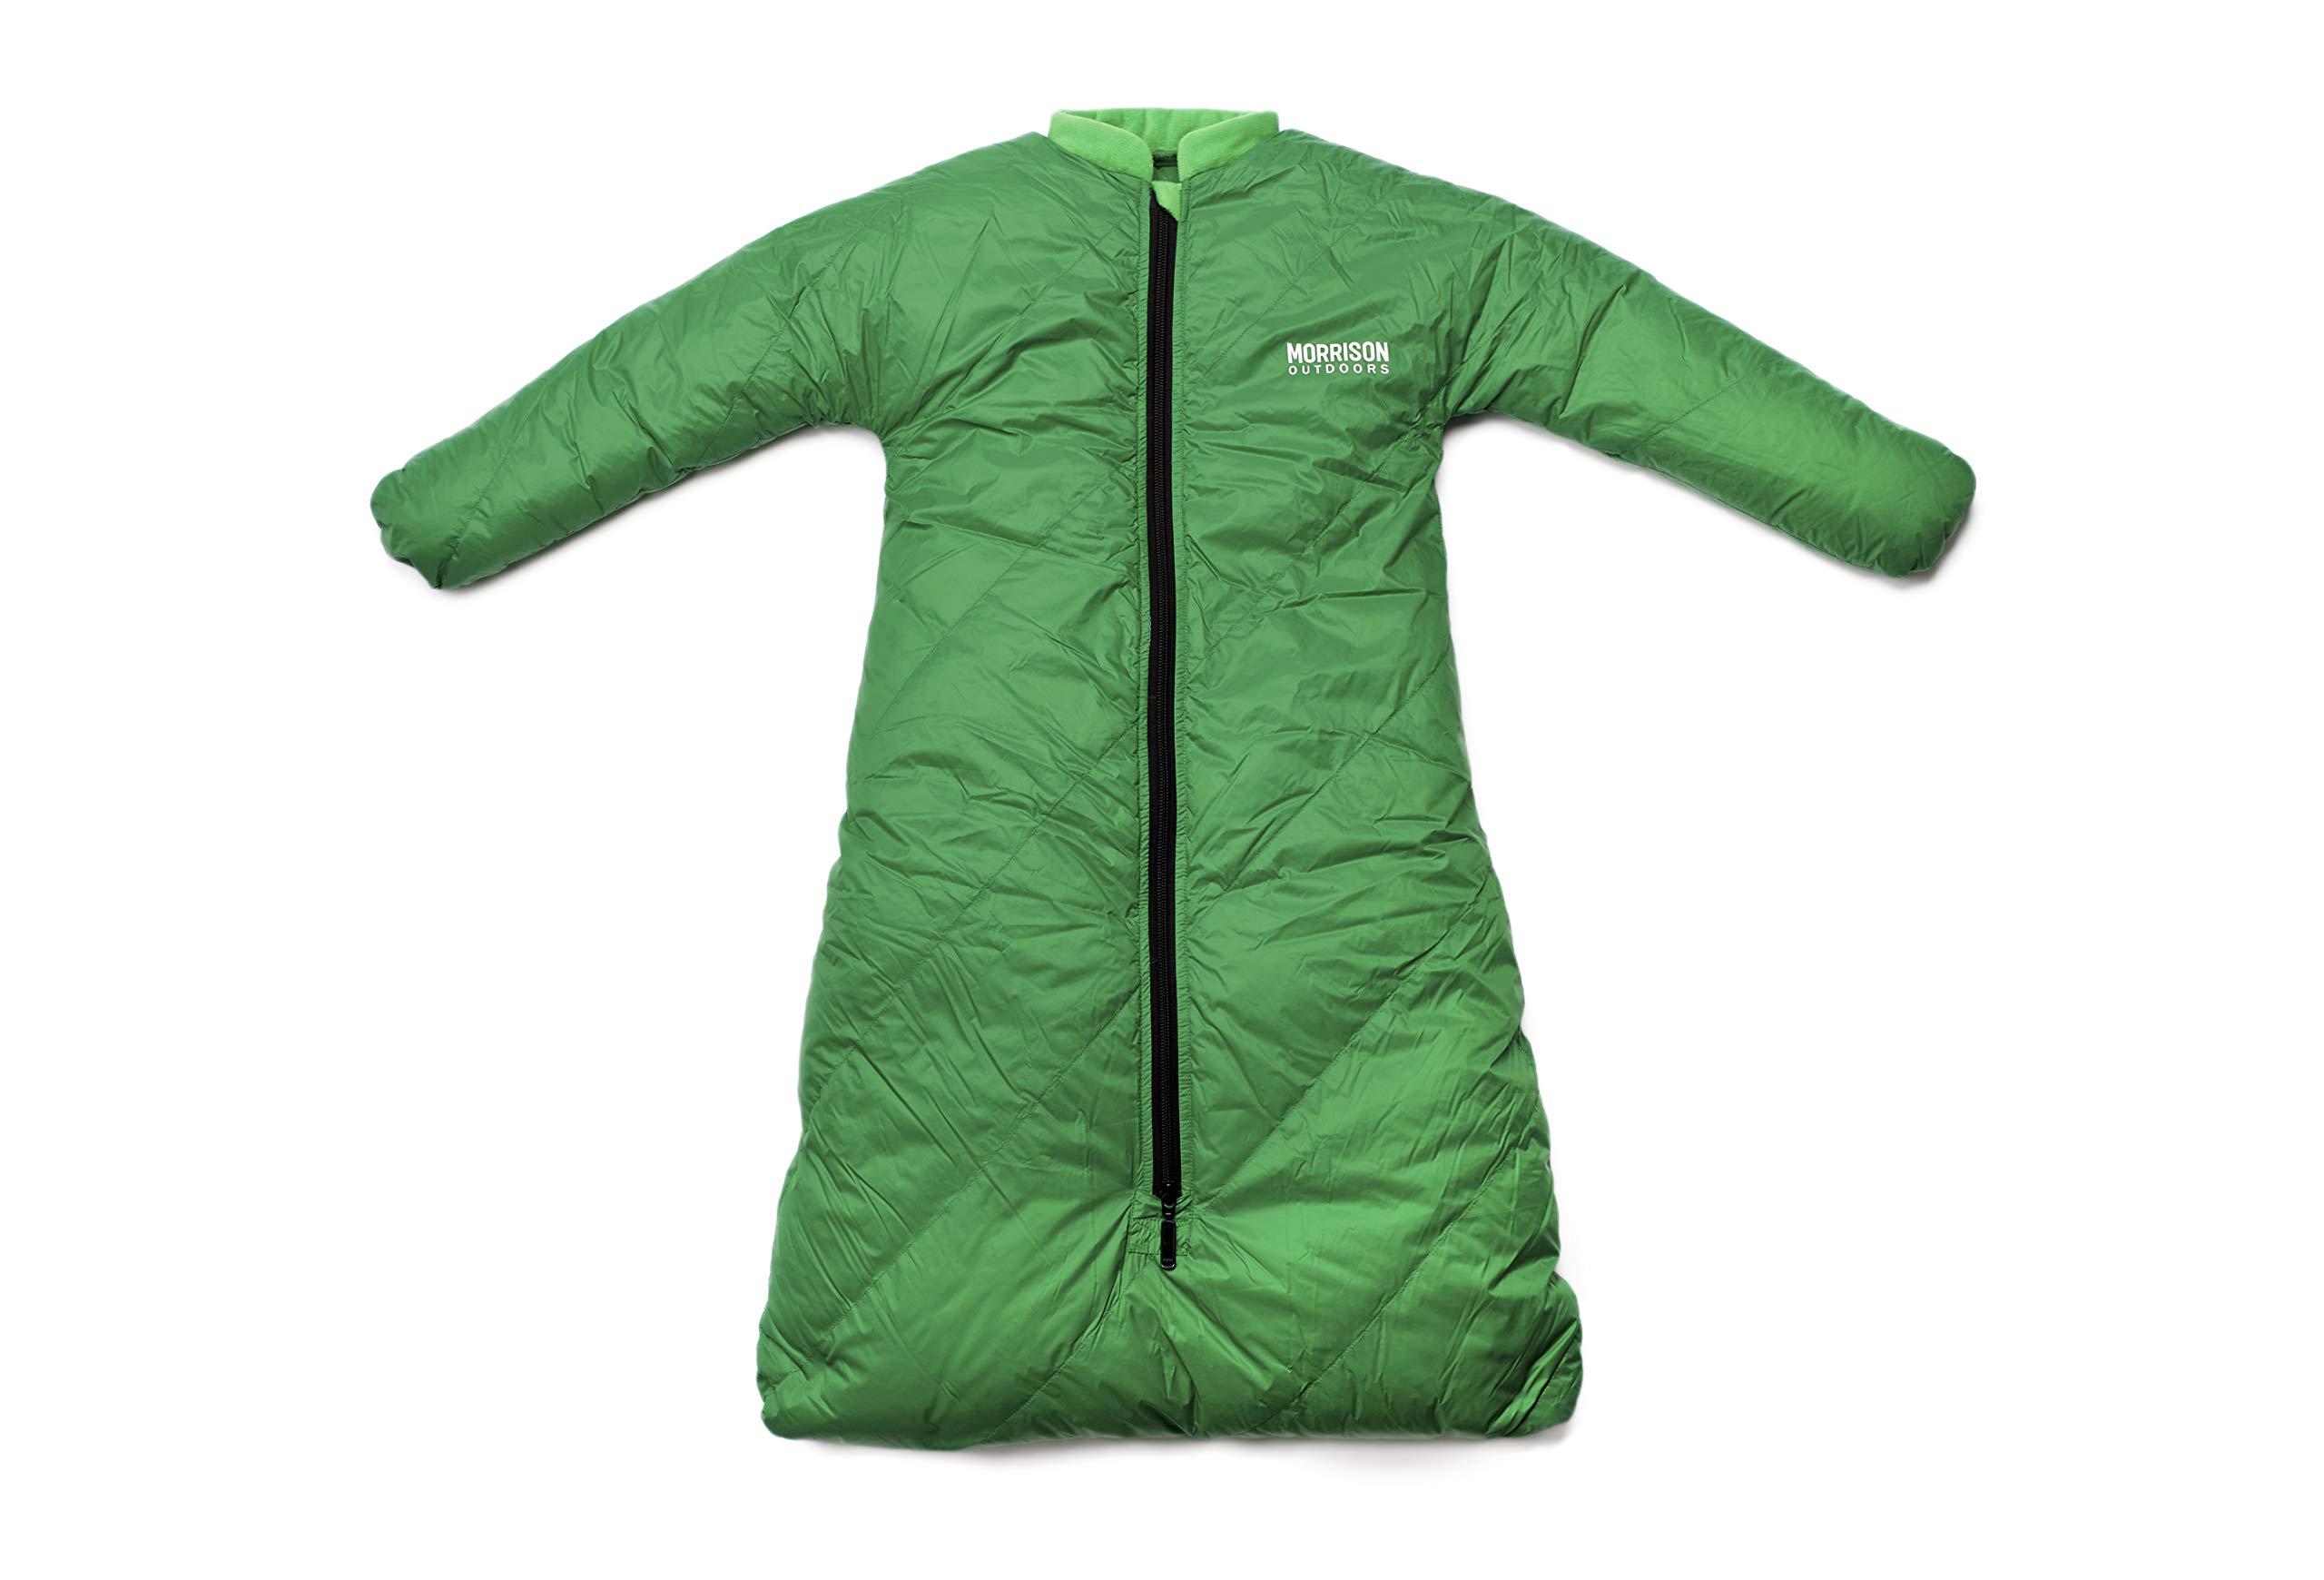 Morrison Outdoors Little Mo 20 Down Baby Sleeping Bag (Moss Green)